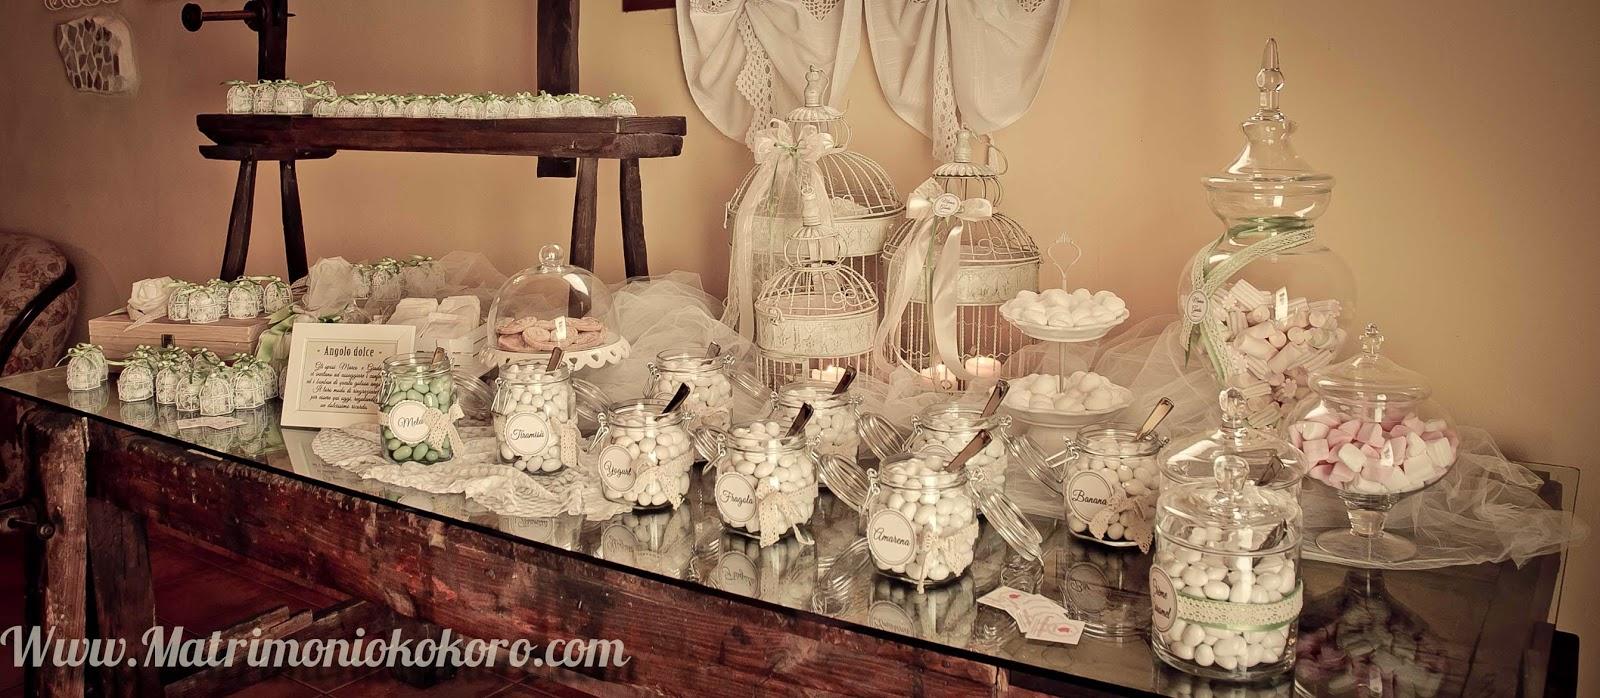 Kokoro sposi matrimoni battesimi bomboniere padova treviso - Confettata matrimonio a casa ...